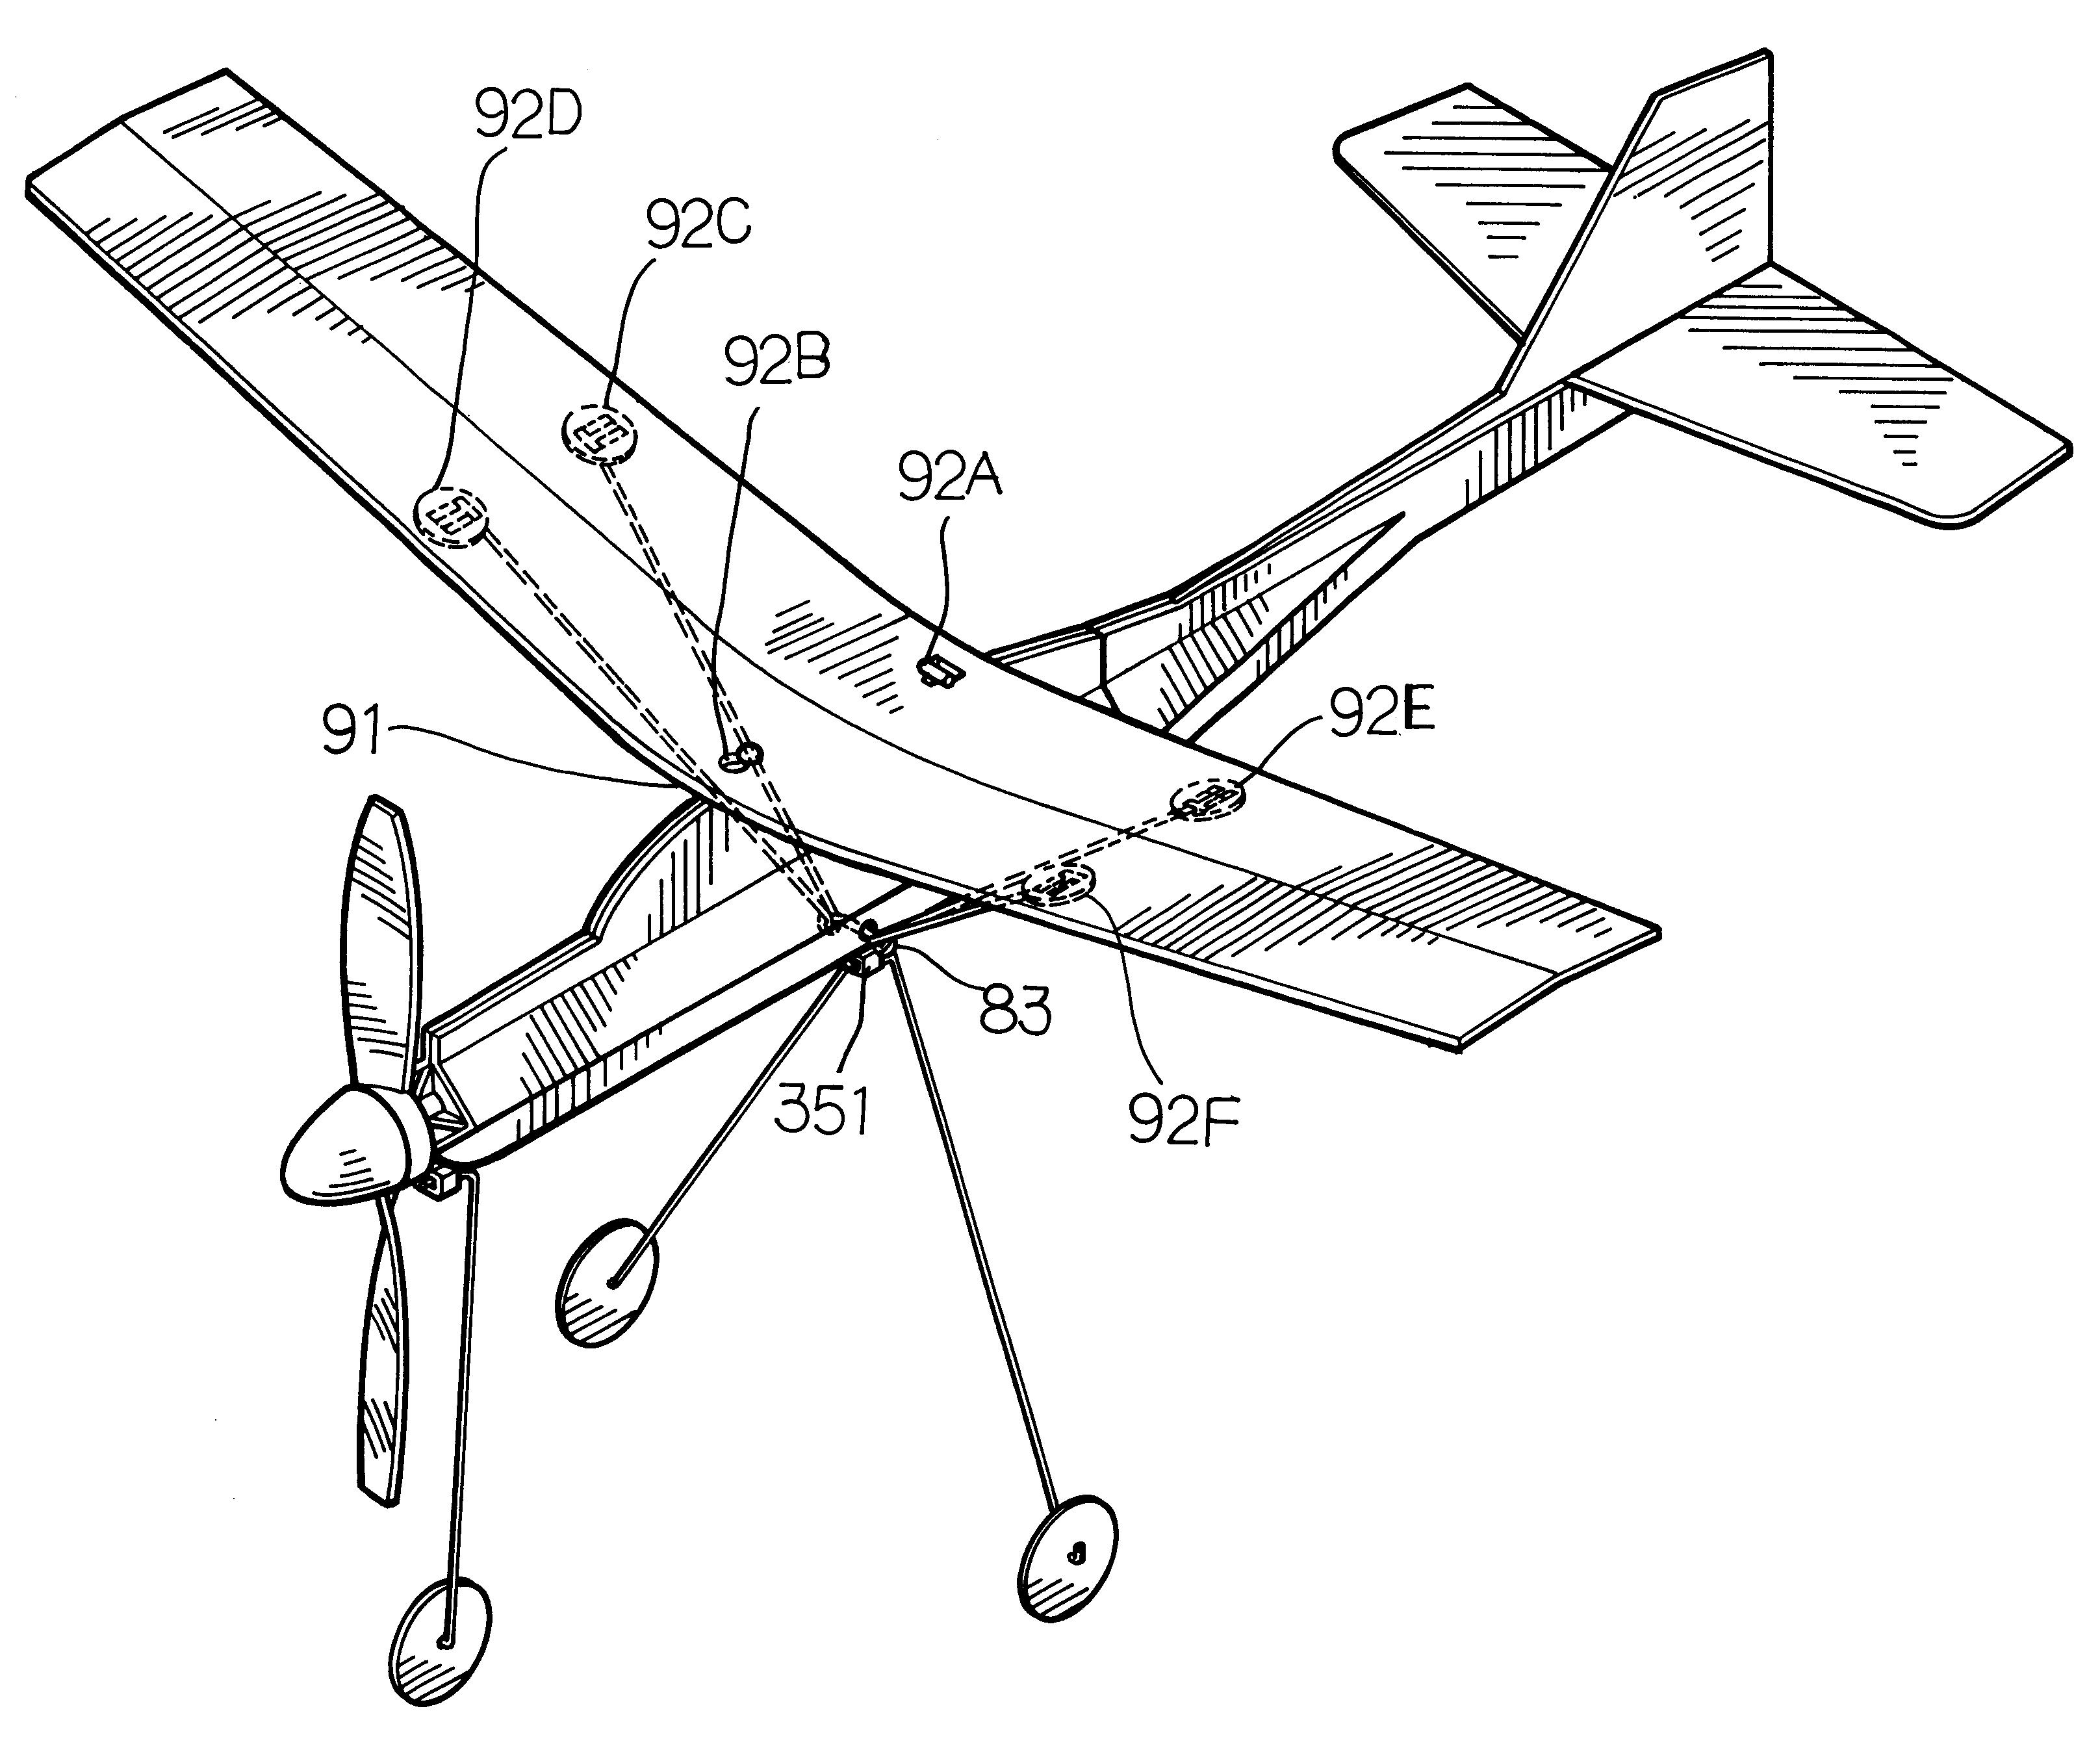 Drawn airplane toy line #8